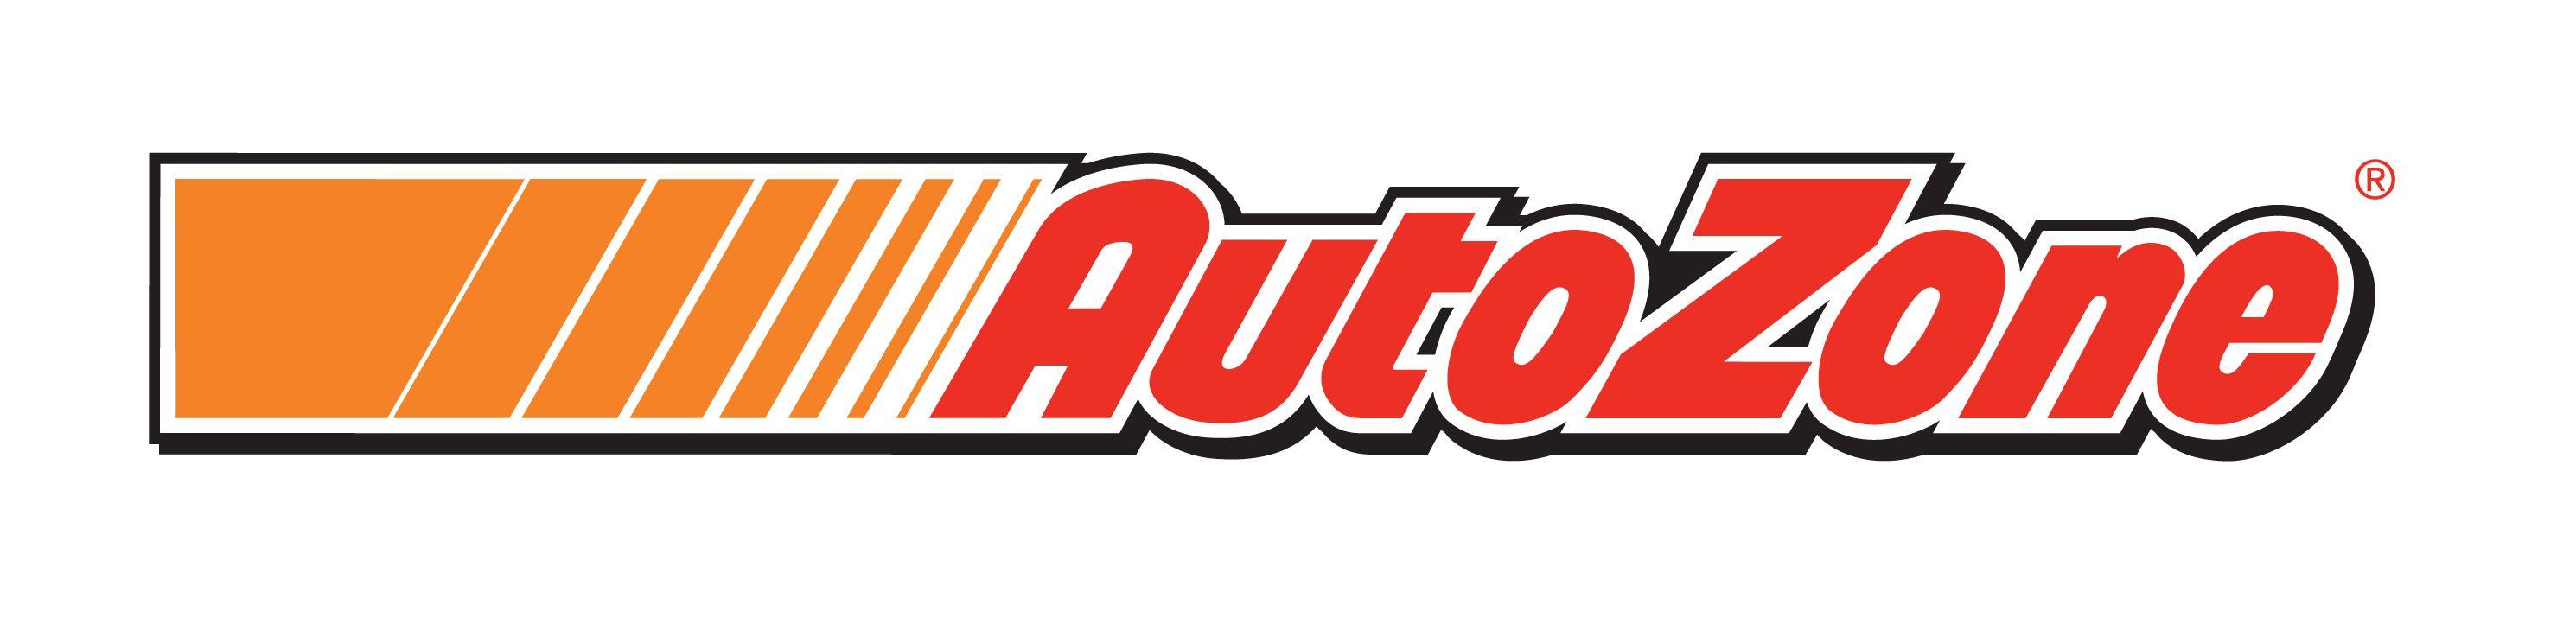 AutoZone logo.